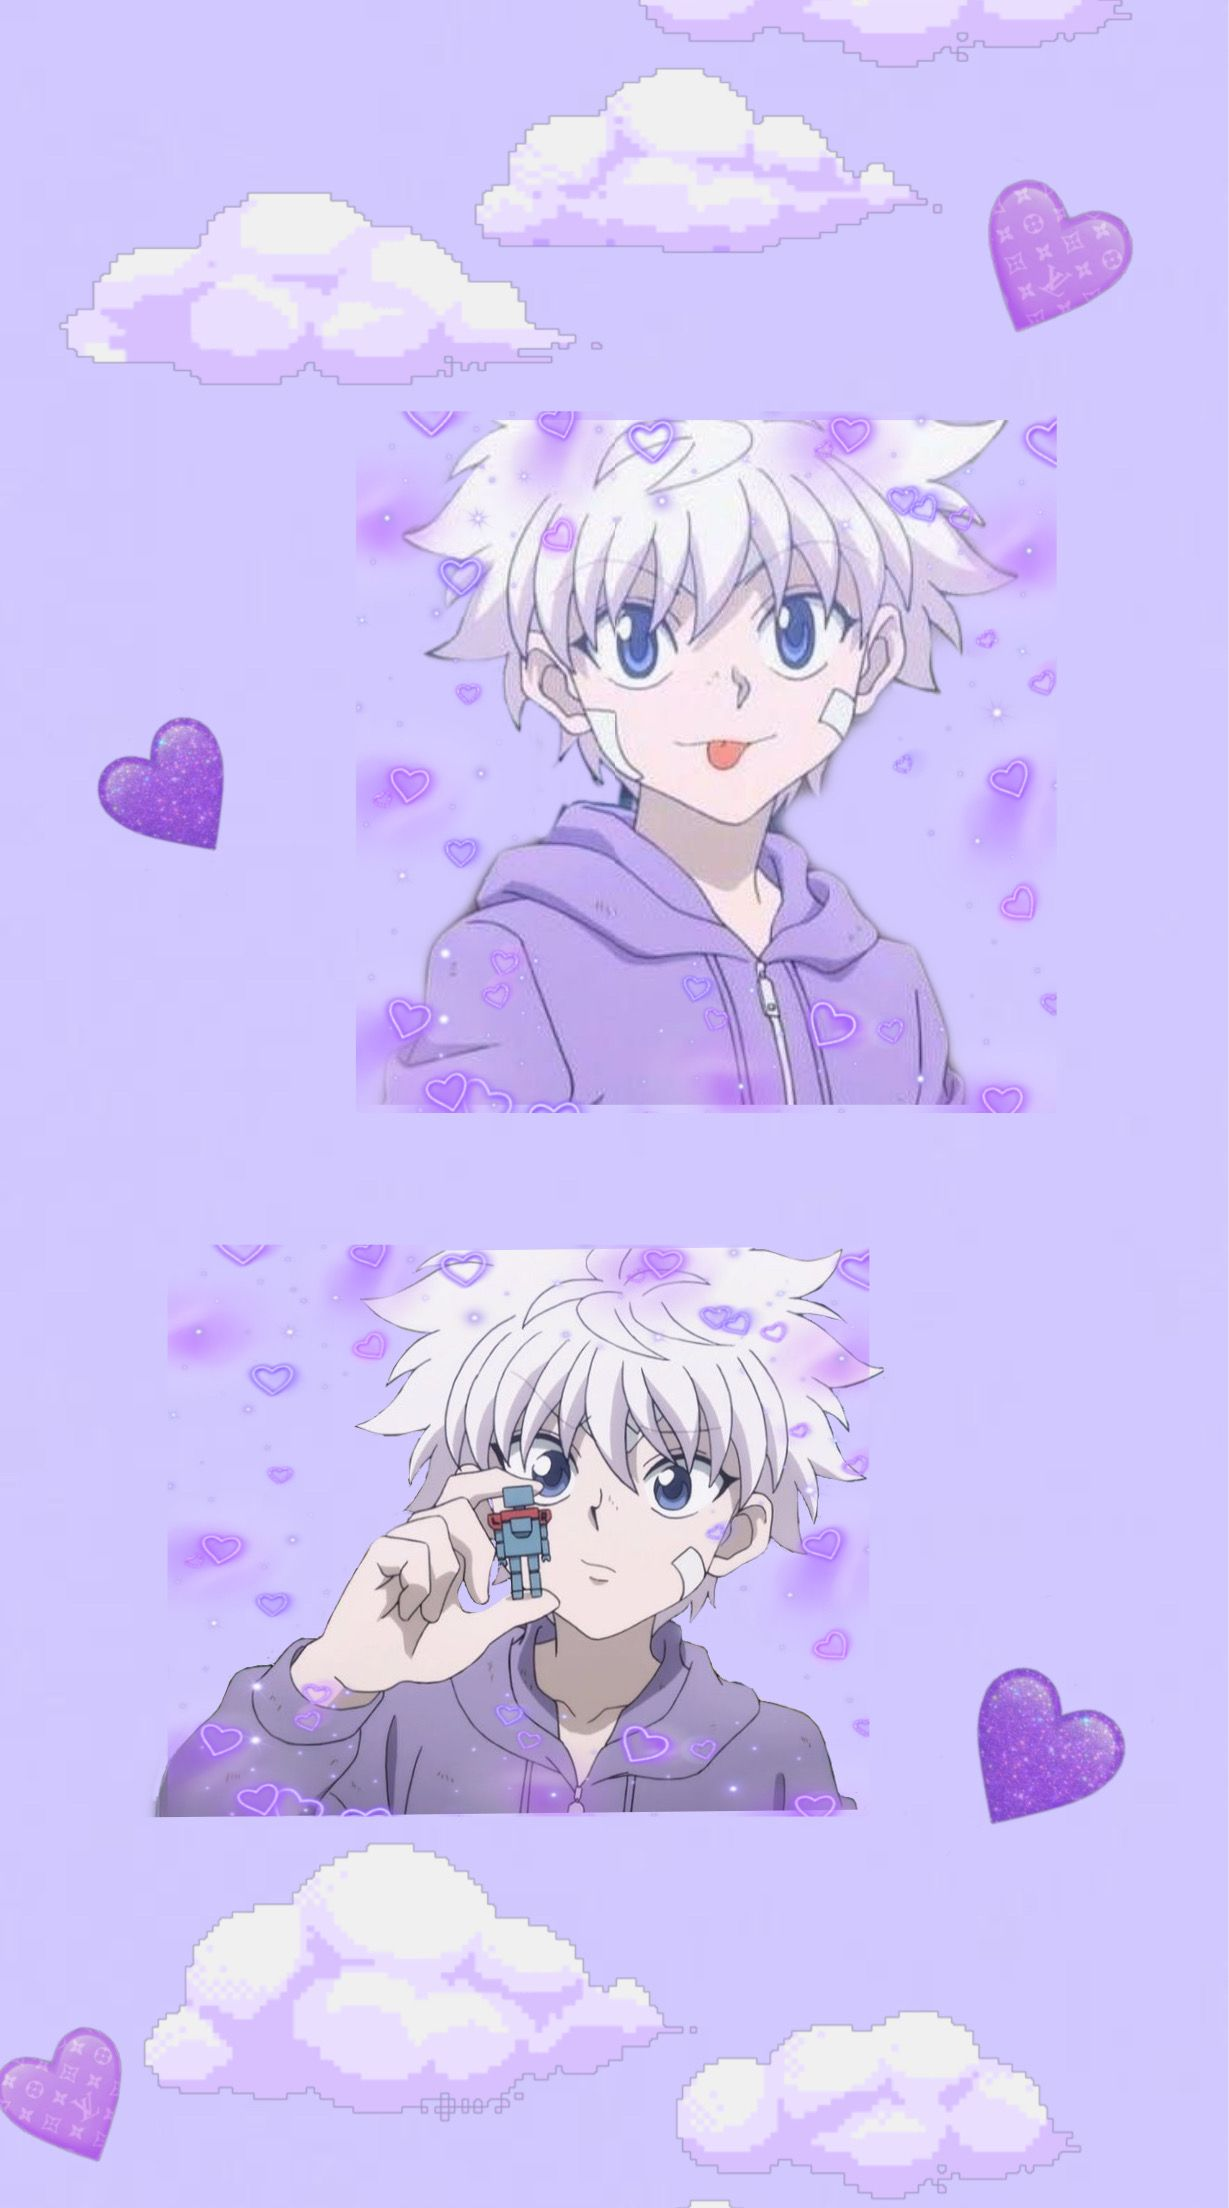 Killua Wallpaper Cute Anime Wallpaper Anime Wallpaper Anime Wallpaper Iphone